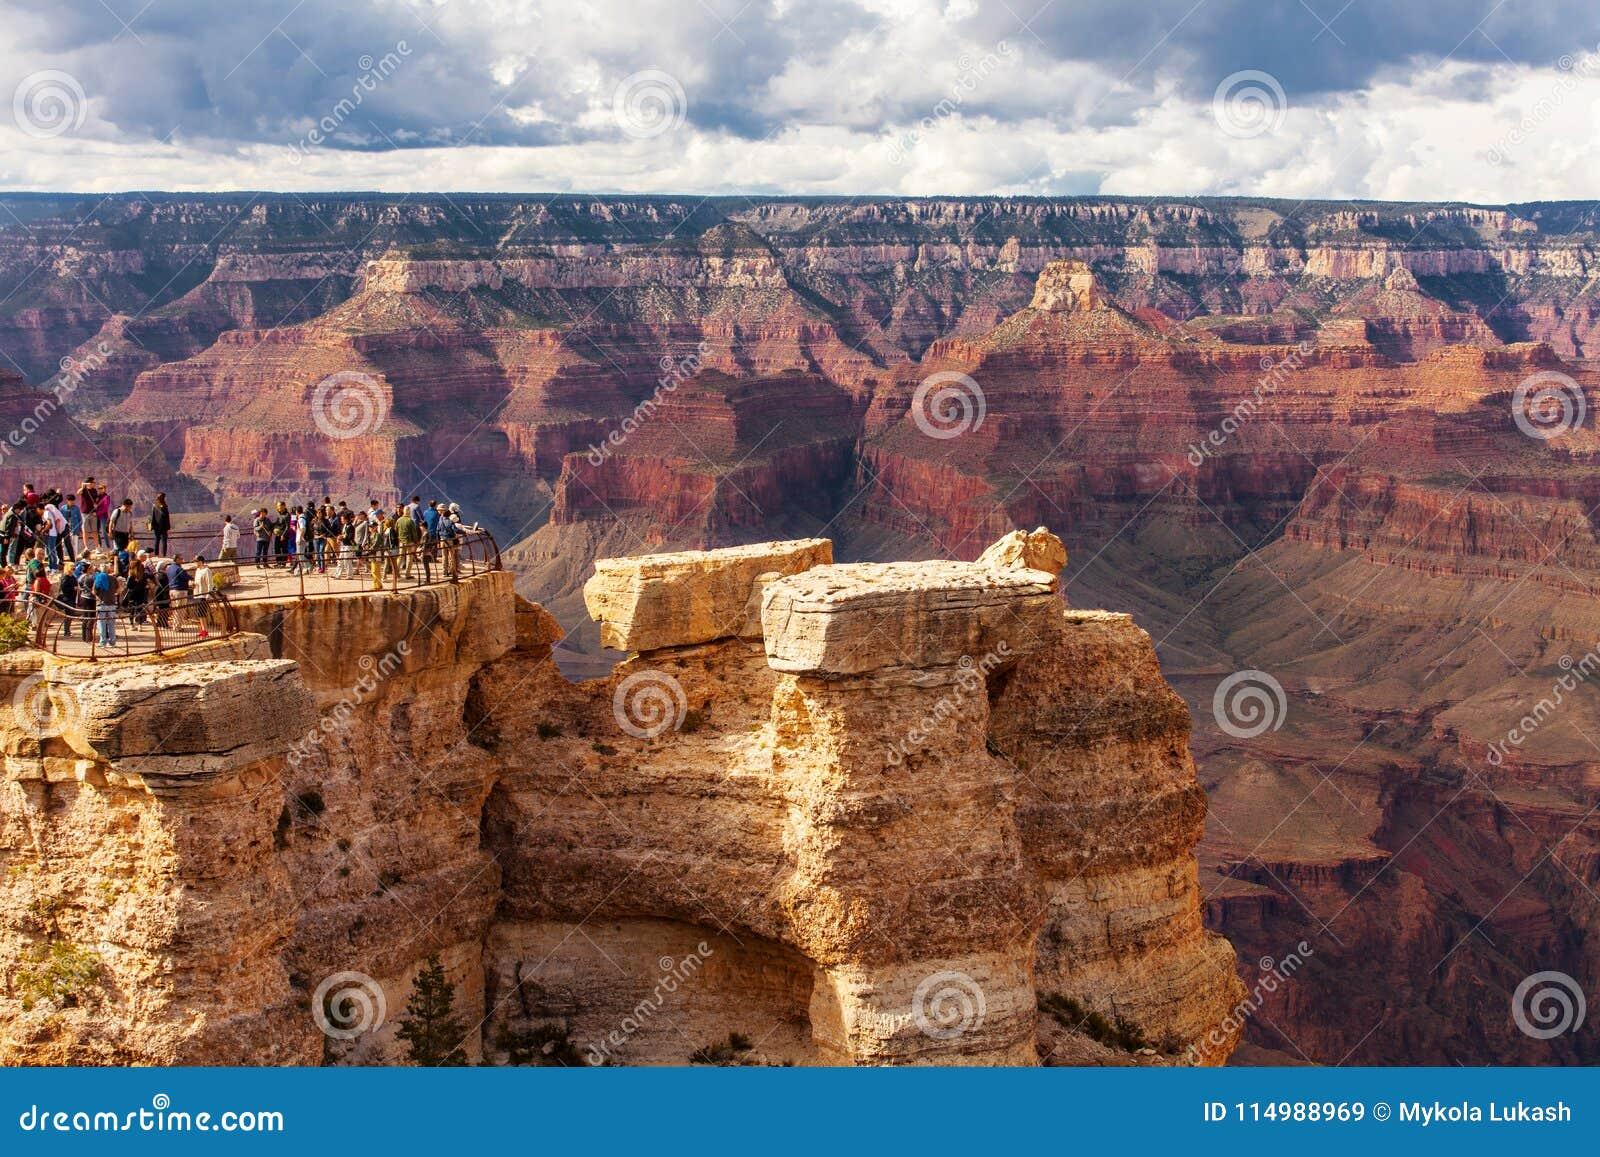 GRAND CANYON, ETATS-UNIS - 18 MAI 2016 : Parc national de Grand Canyon de vue scénique, Arizona, Etats-Unis Personnes de touriste